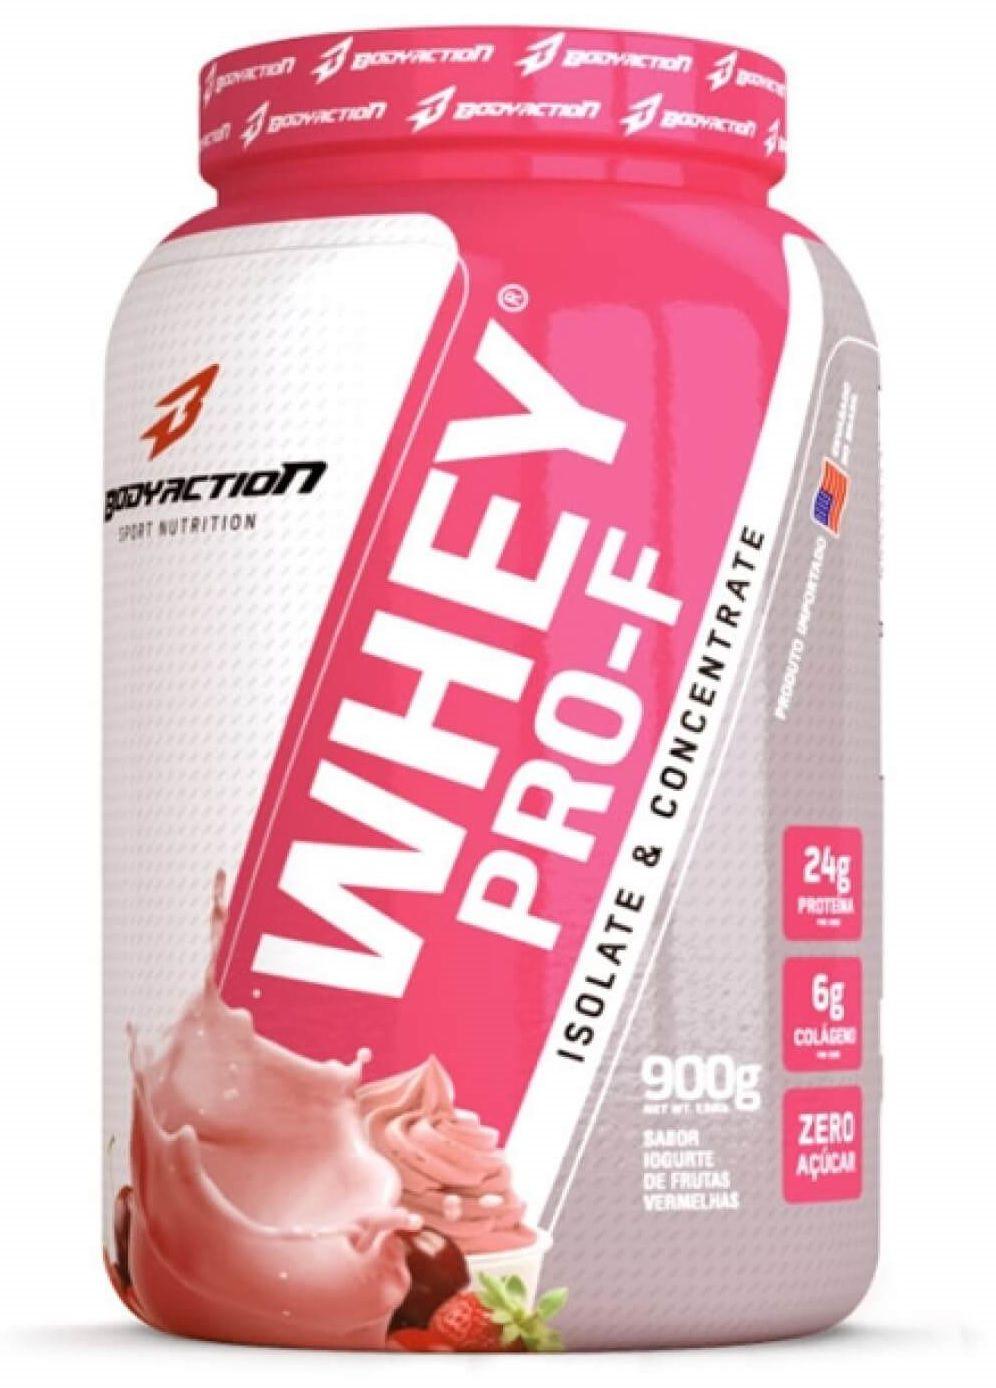 Whey Pro-F Body Action - 900g